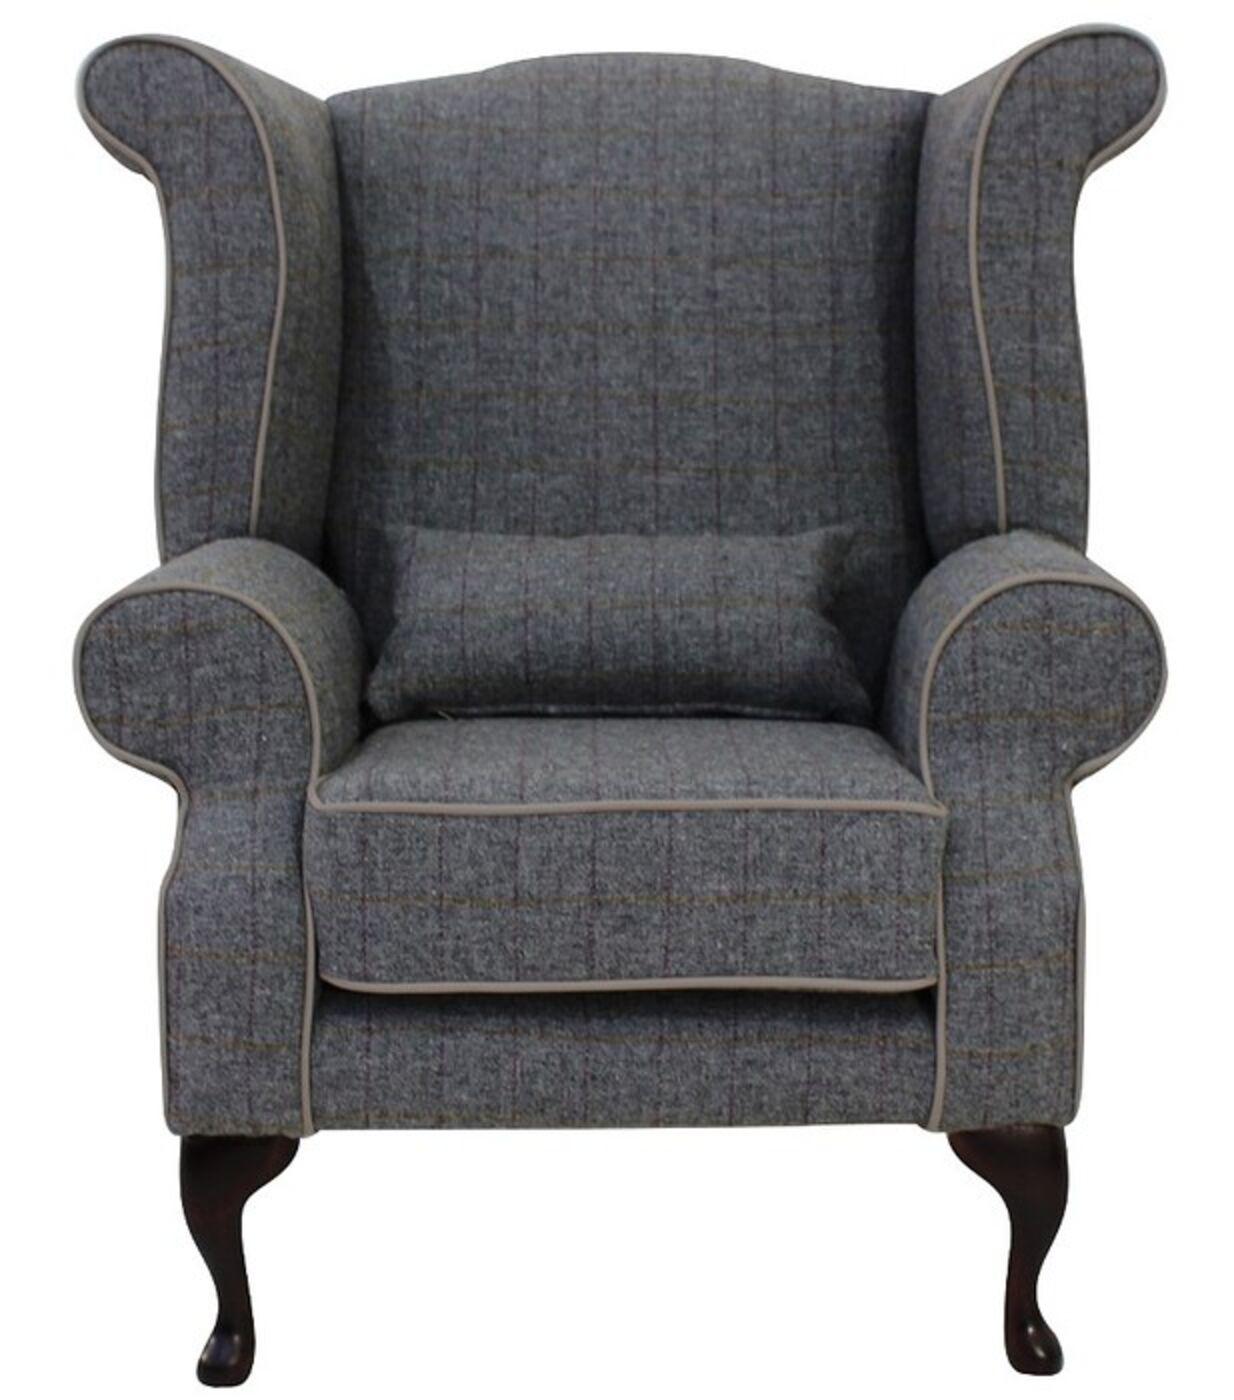 Wonderful Chesterfield Harris Tweed Edward Queen Anne Wool Wing Chair Fireside High  Back Armchair Huntsman Check Slate Grey